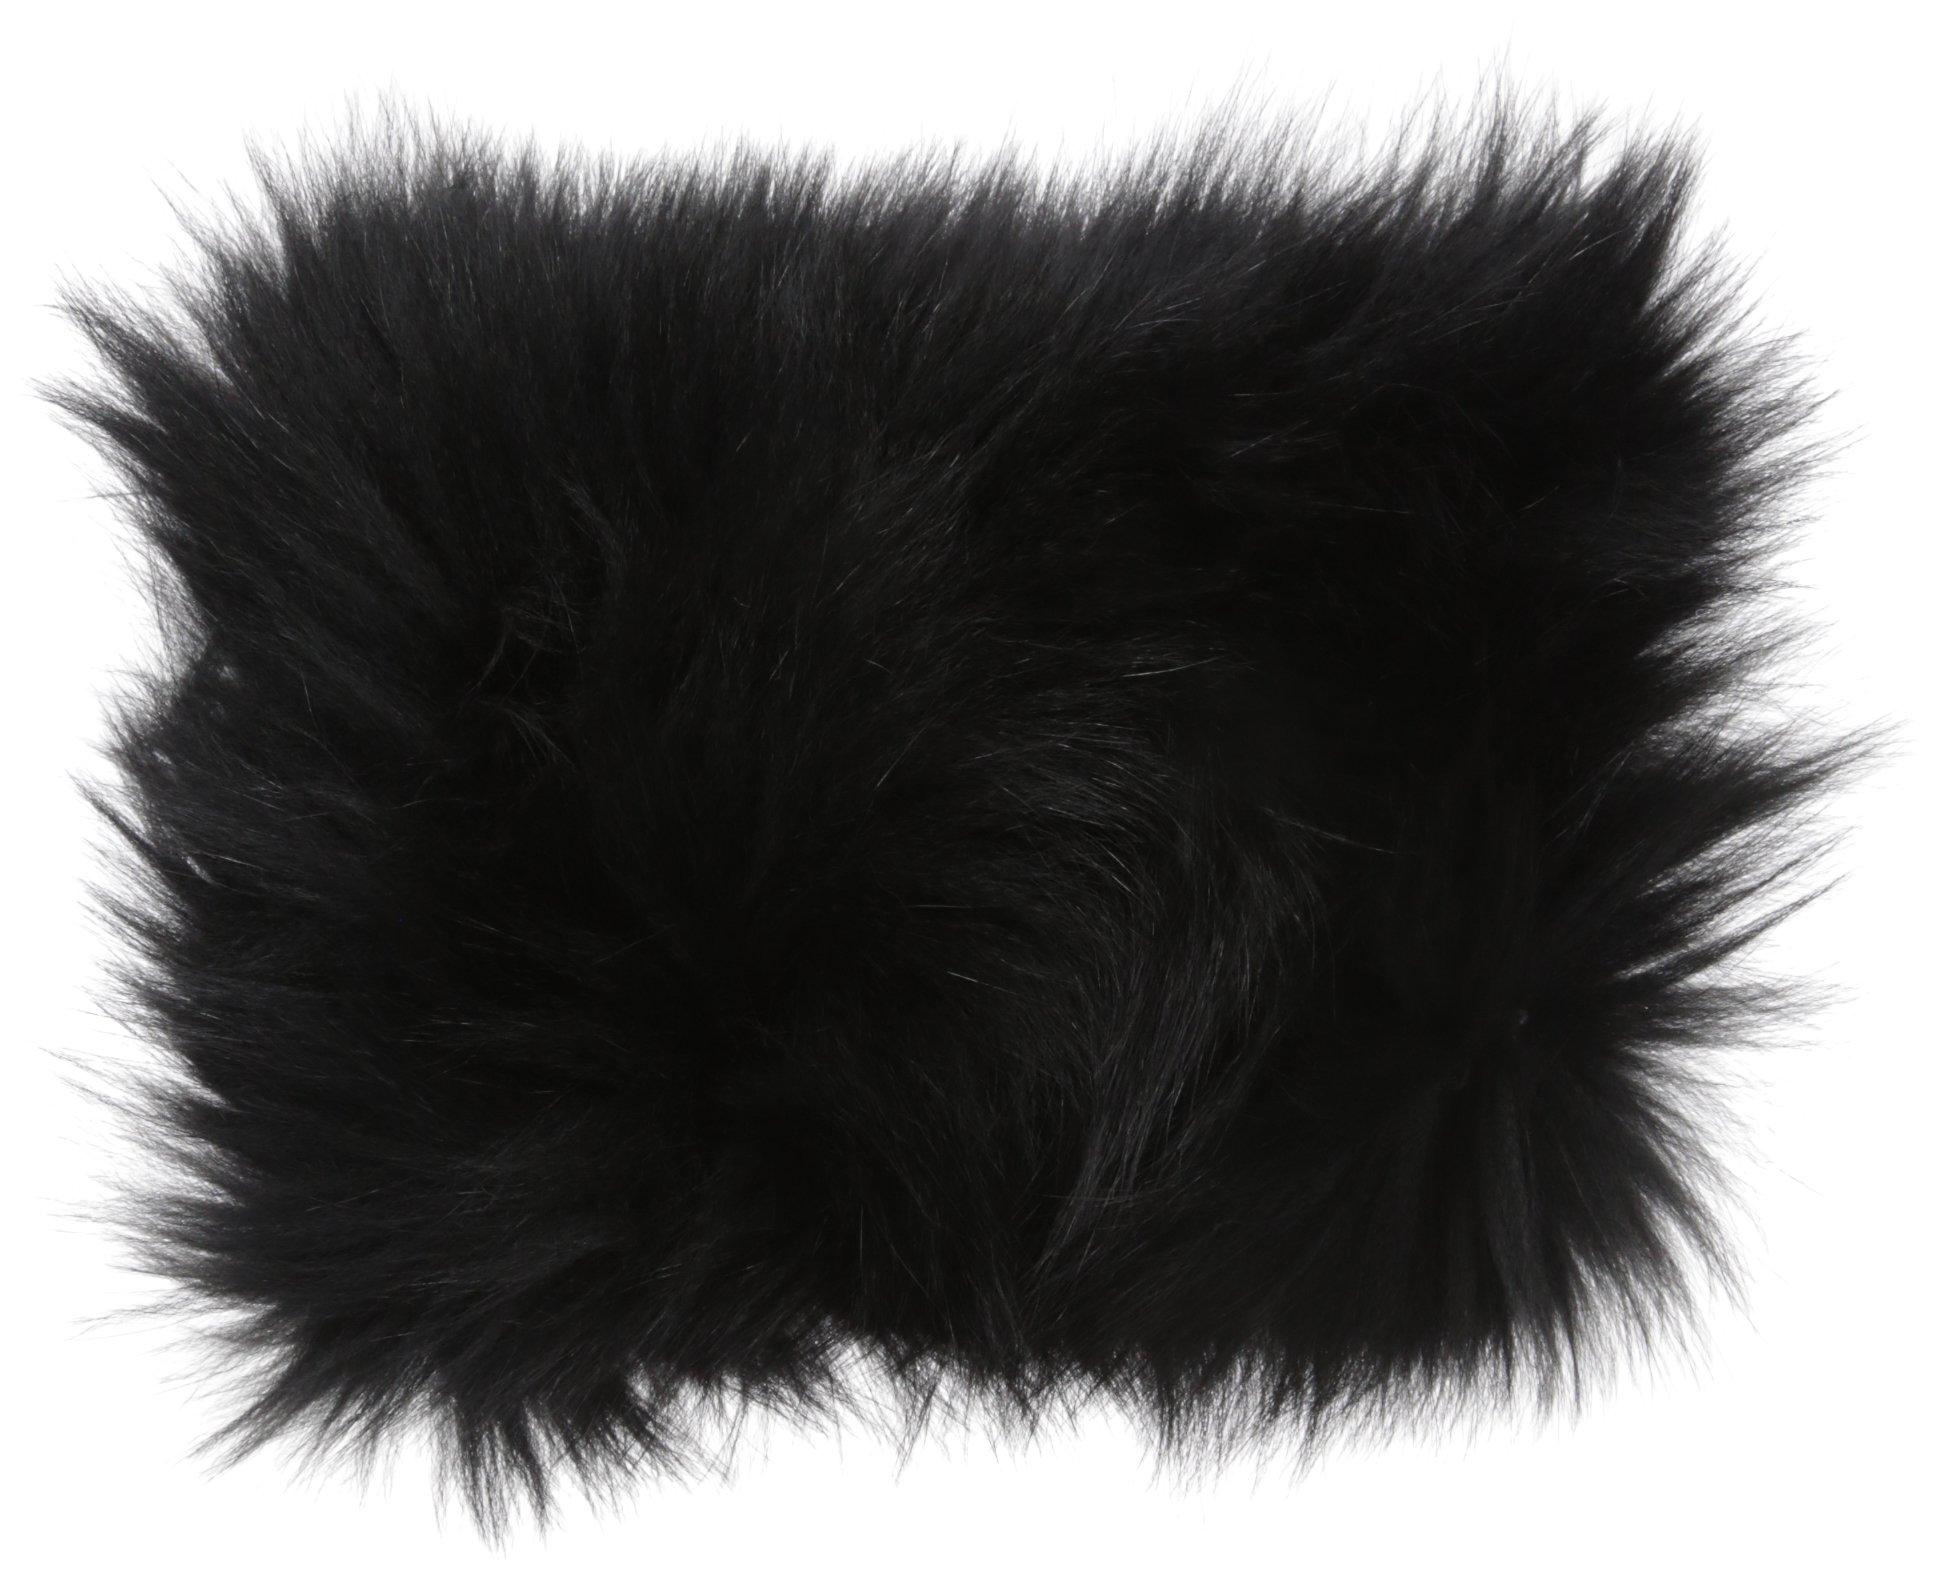 La Fiorentina Women's Fur Headband, Black One Size